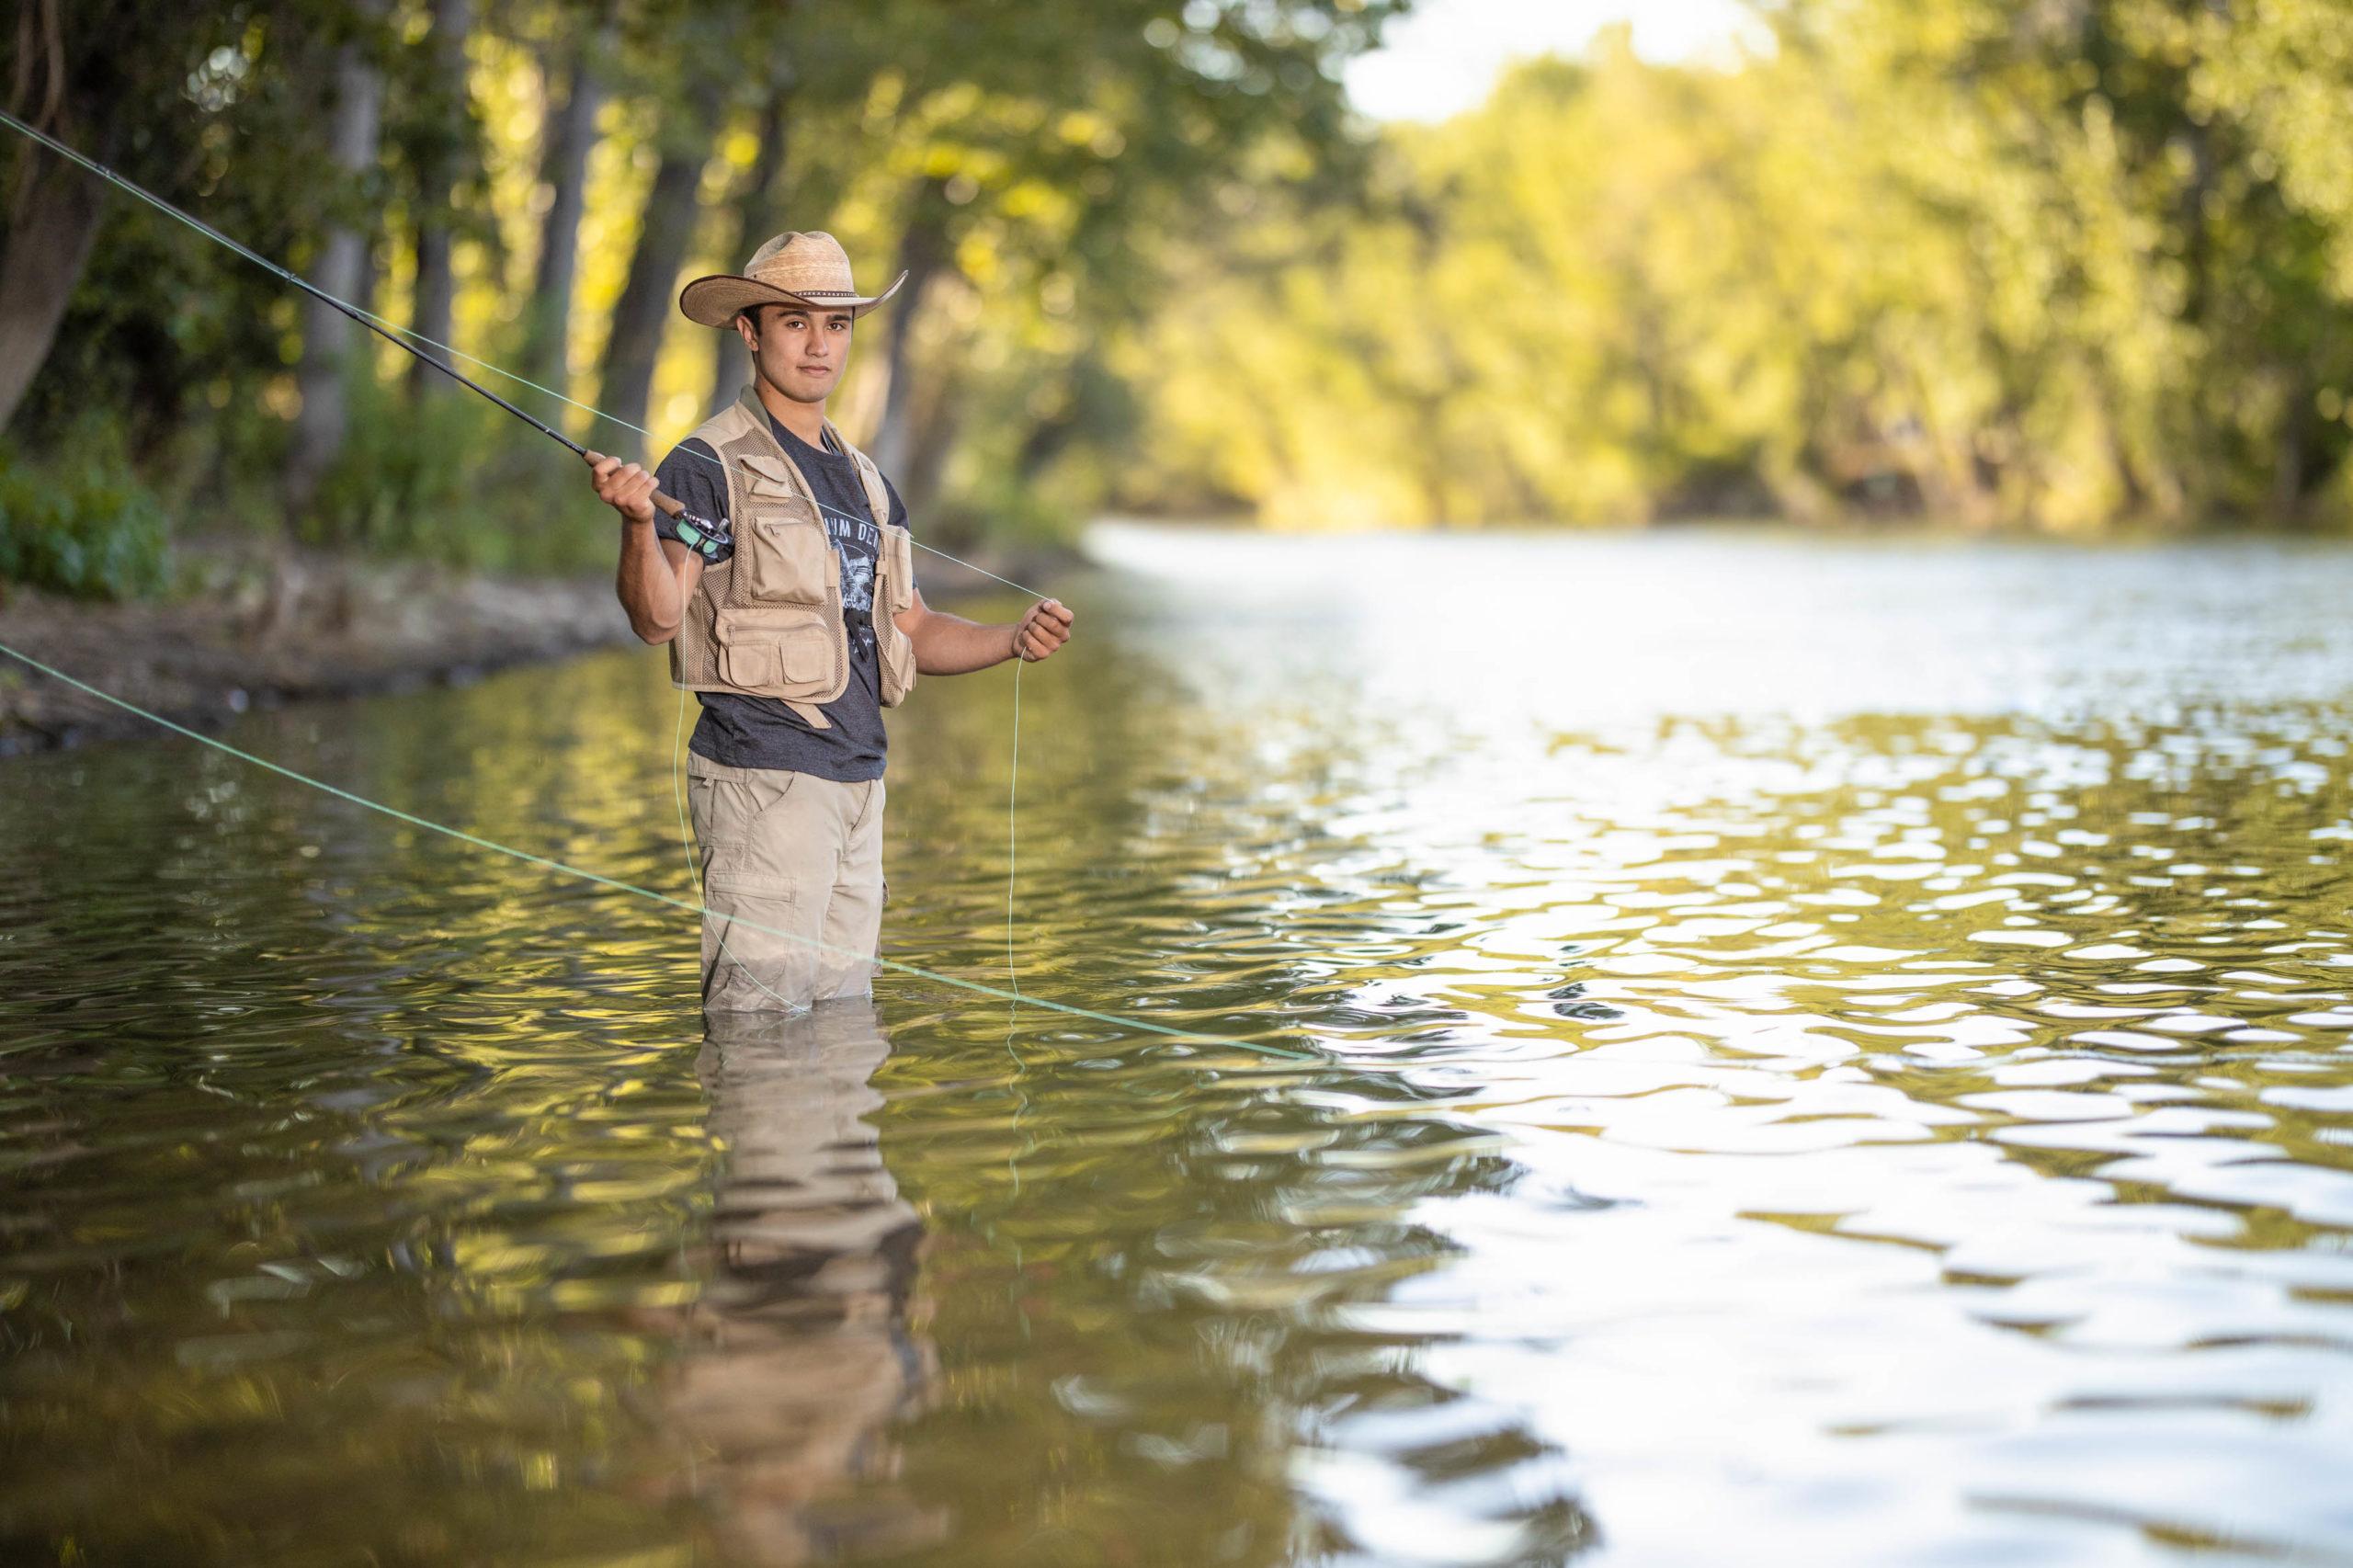 senior boy fly fishing in the Boise River in Idaho